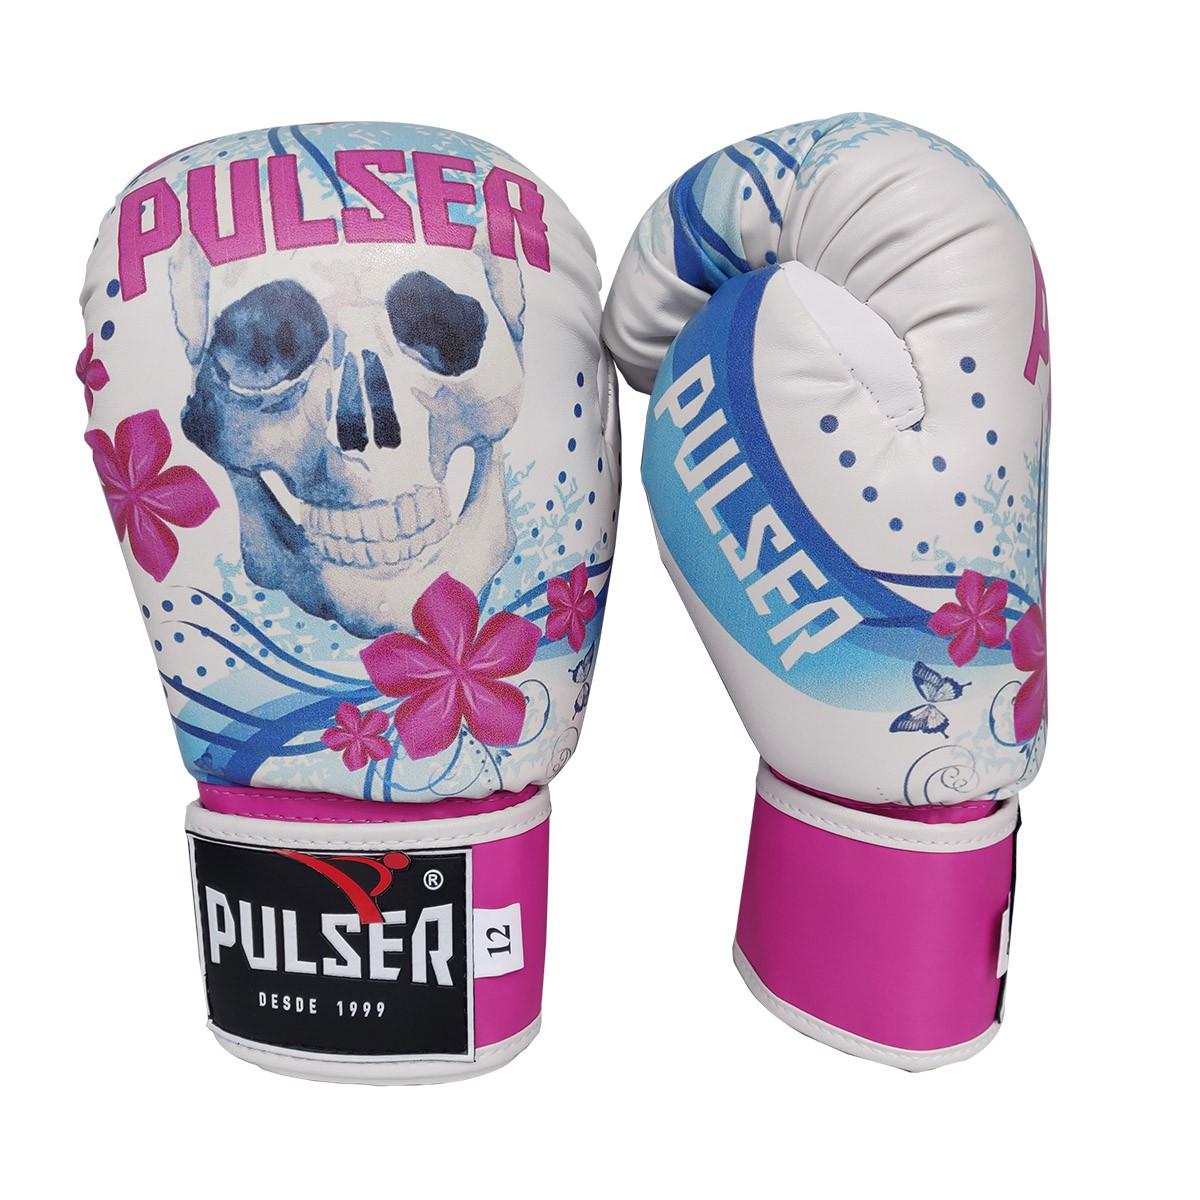 Kit de Muay Thai / Kickboxing Feminino 12oz - Caveira Azul Floral - Pulser  - PRALUTA SHOP